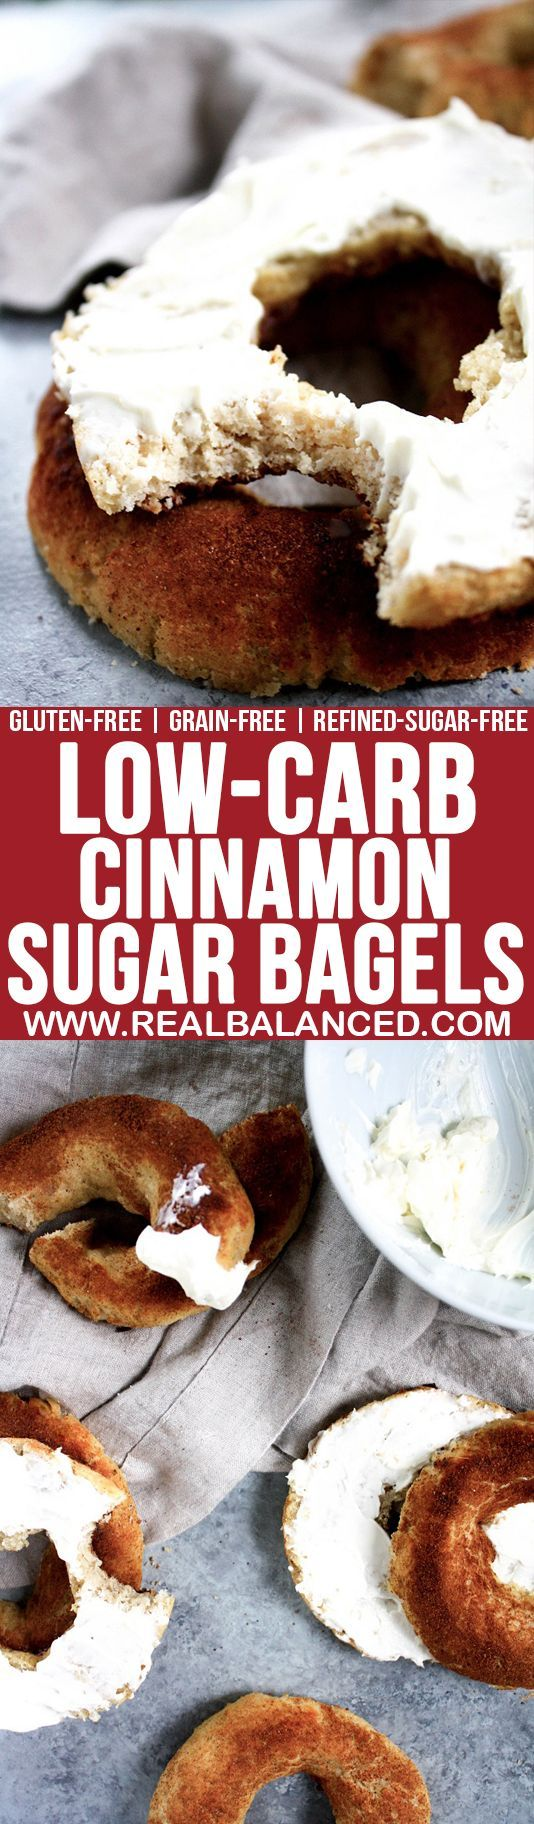 Low-Carb Cinnamon Sugar Bagels: Low-carb, gluten-free, grain-free, vegetarian, & refined-sugar-free; only 5.6g net carbs per serving!